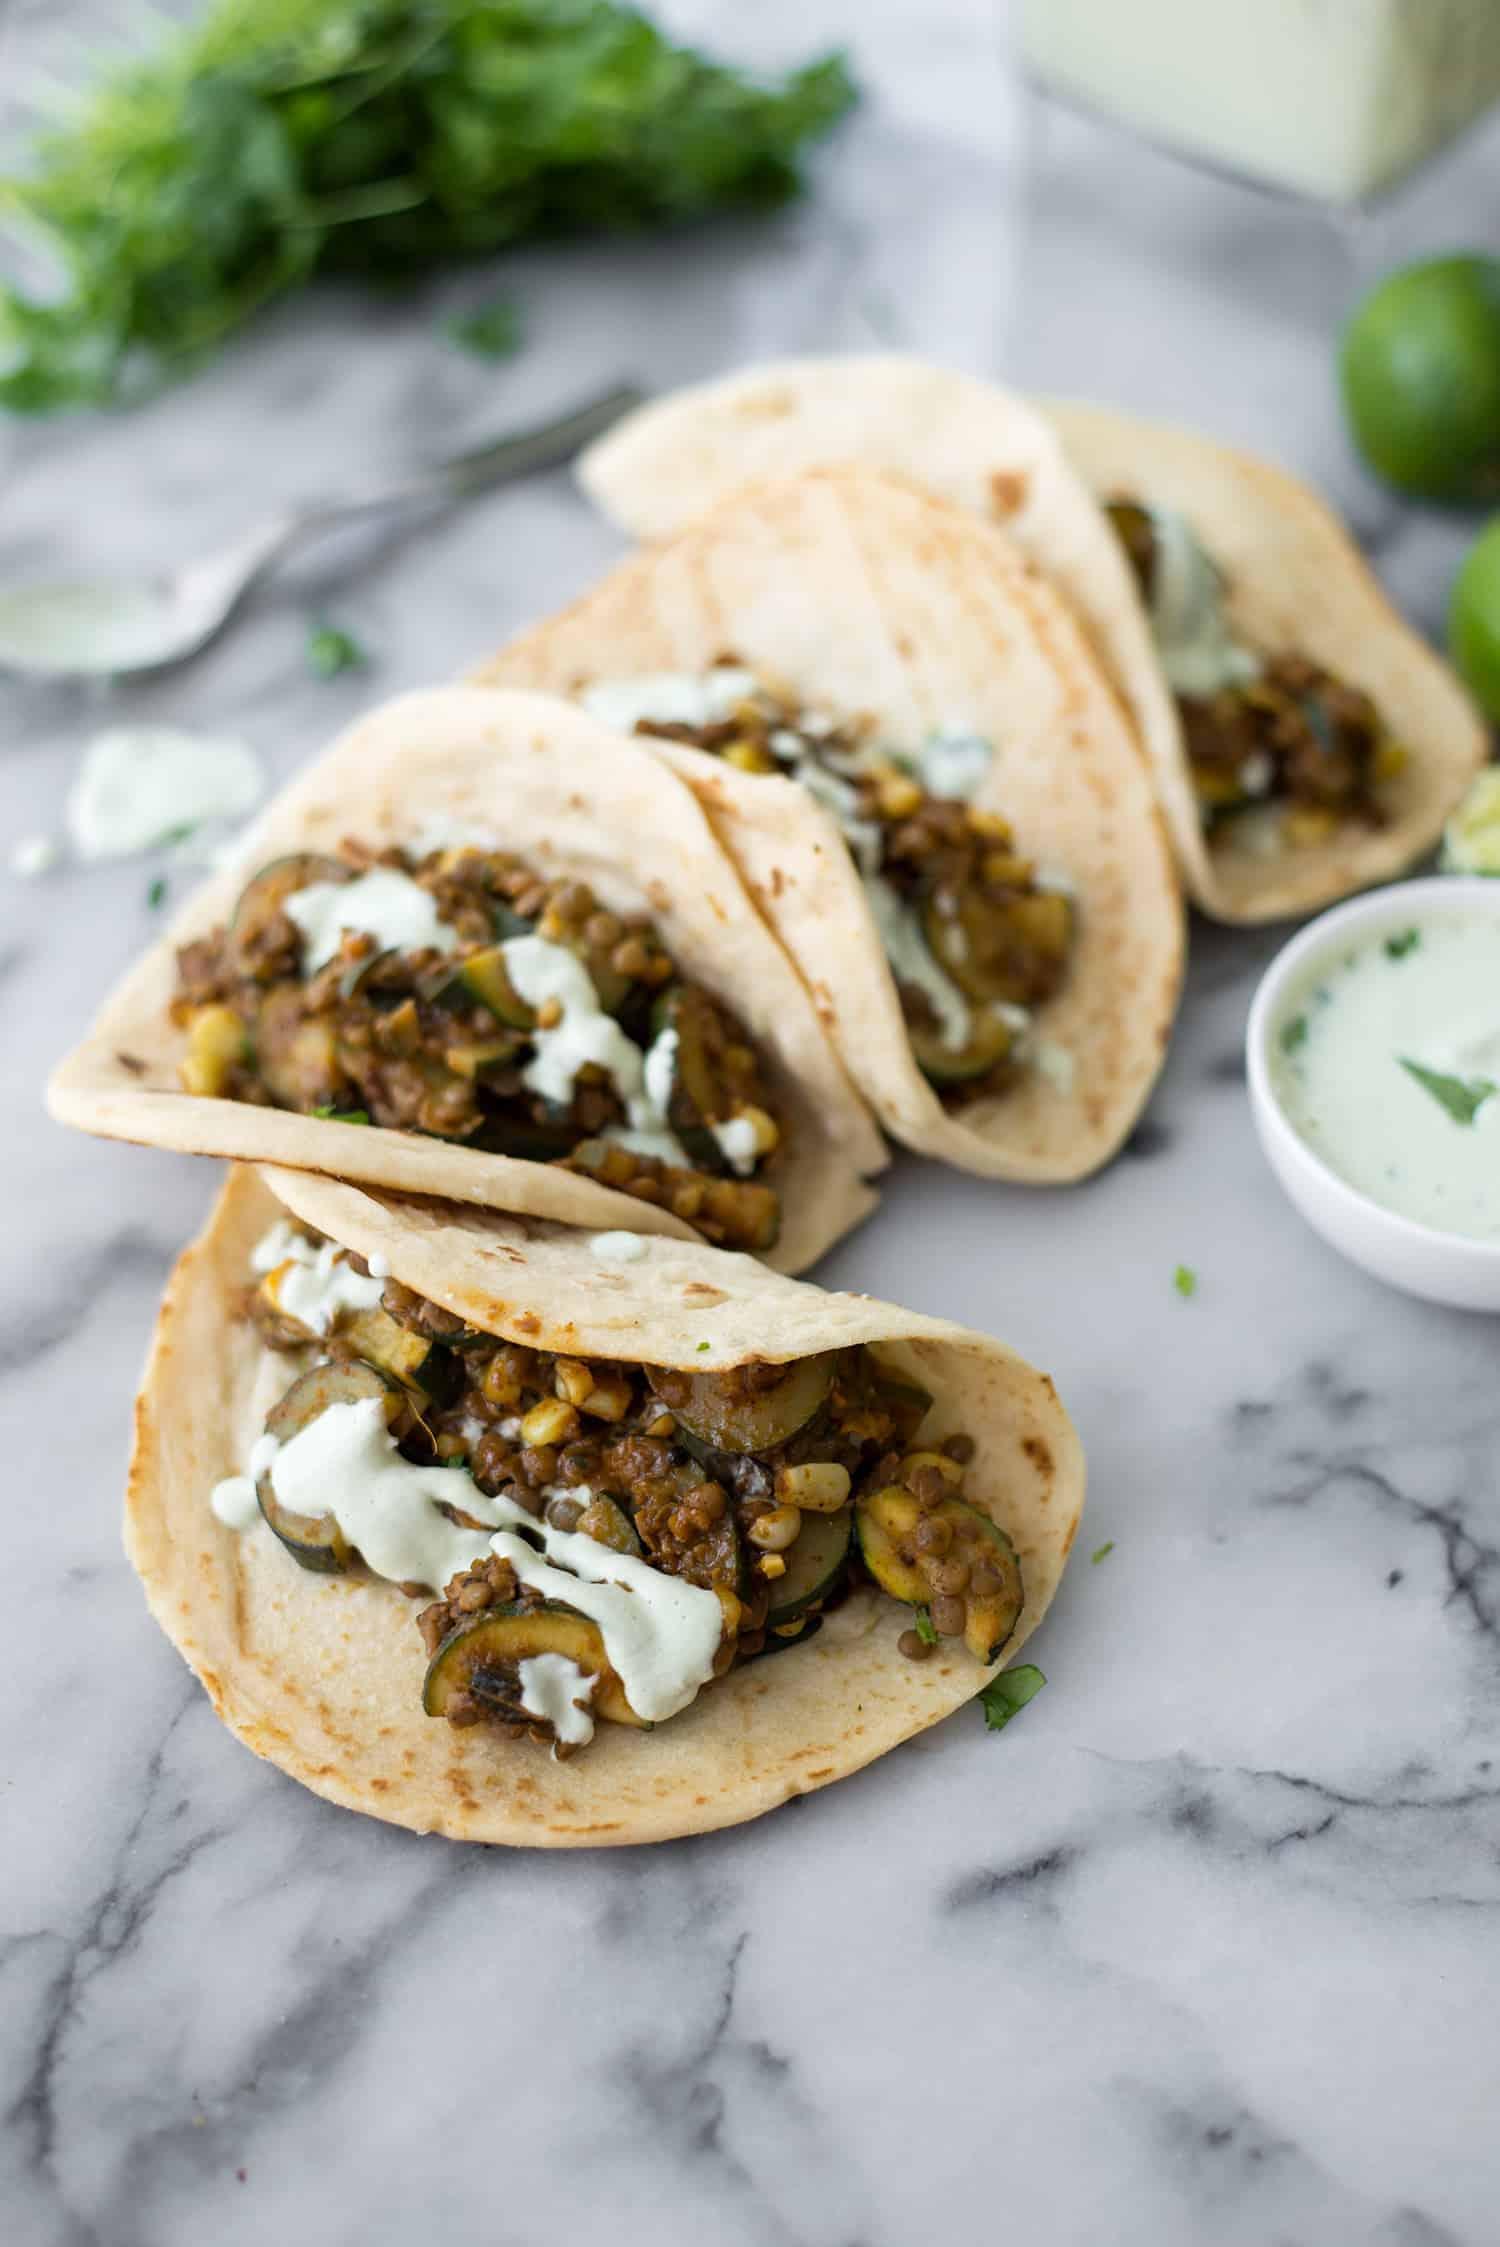 Vegan Zucchini and Lentil Tacos - Delish Knowledge